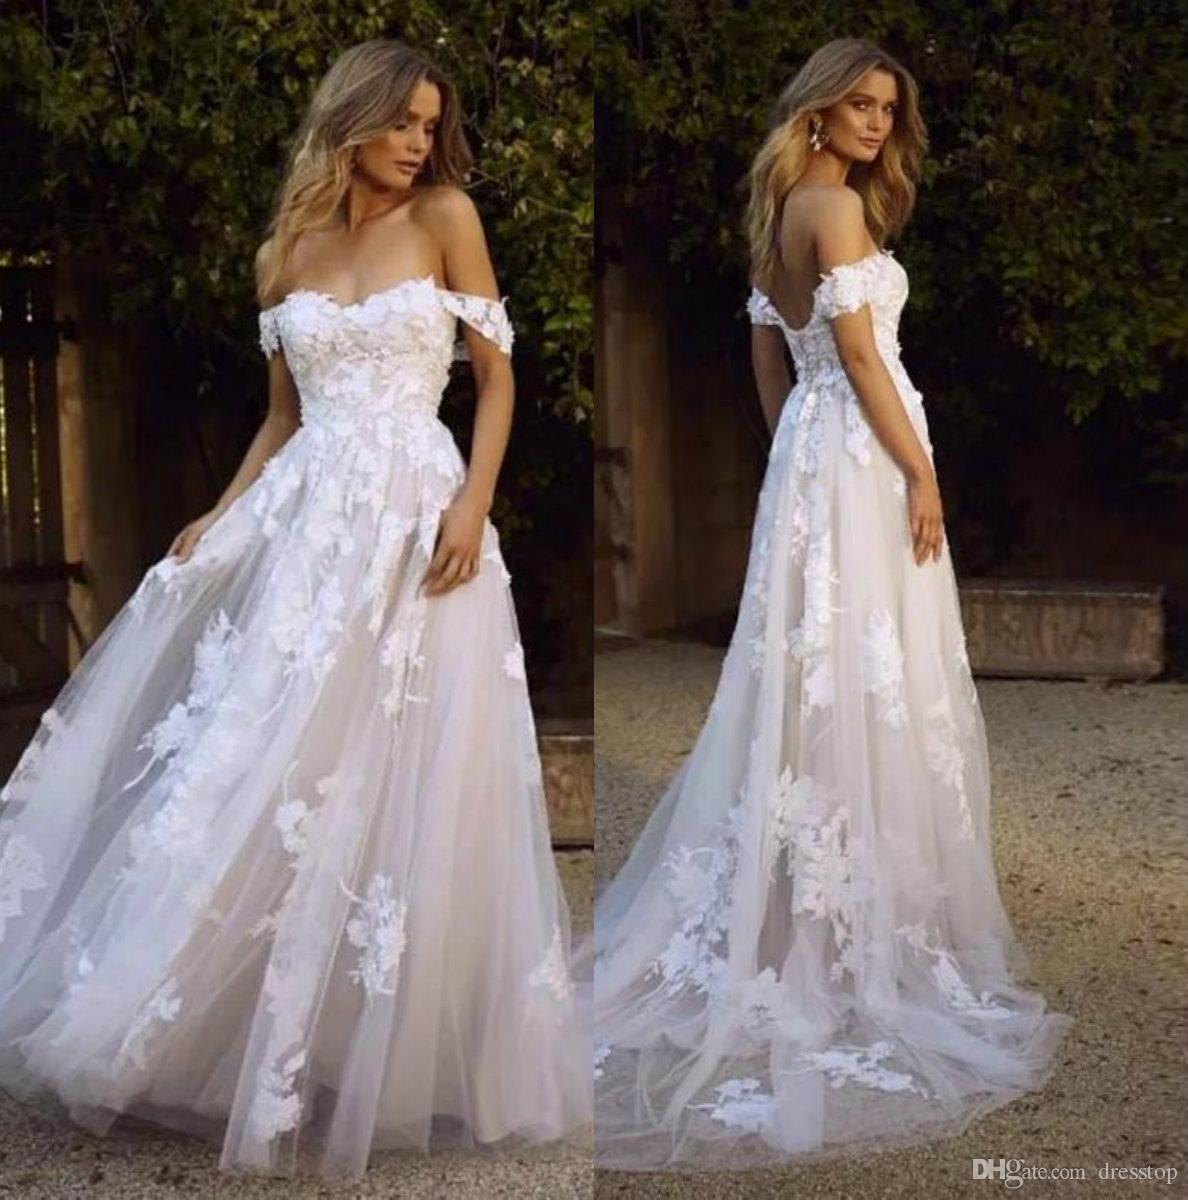 Wedding Gown Off White Bohemian Discount Vintage 2019 White Wedding Dresses Off Beach Wedding Dress Boho Lace Wedding Dress Vintage November Wedding Dresses [ 1200 x 1188 Pixel ]